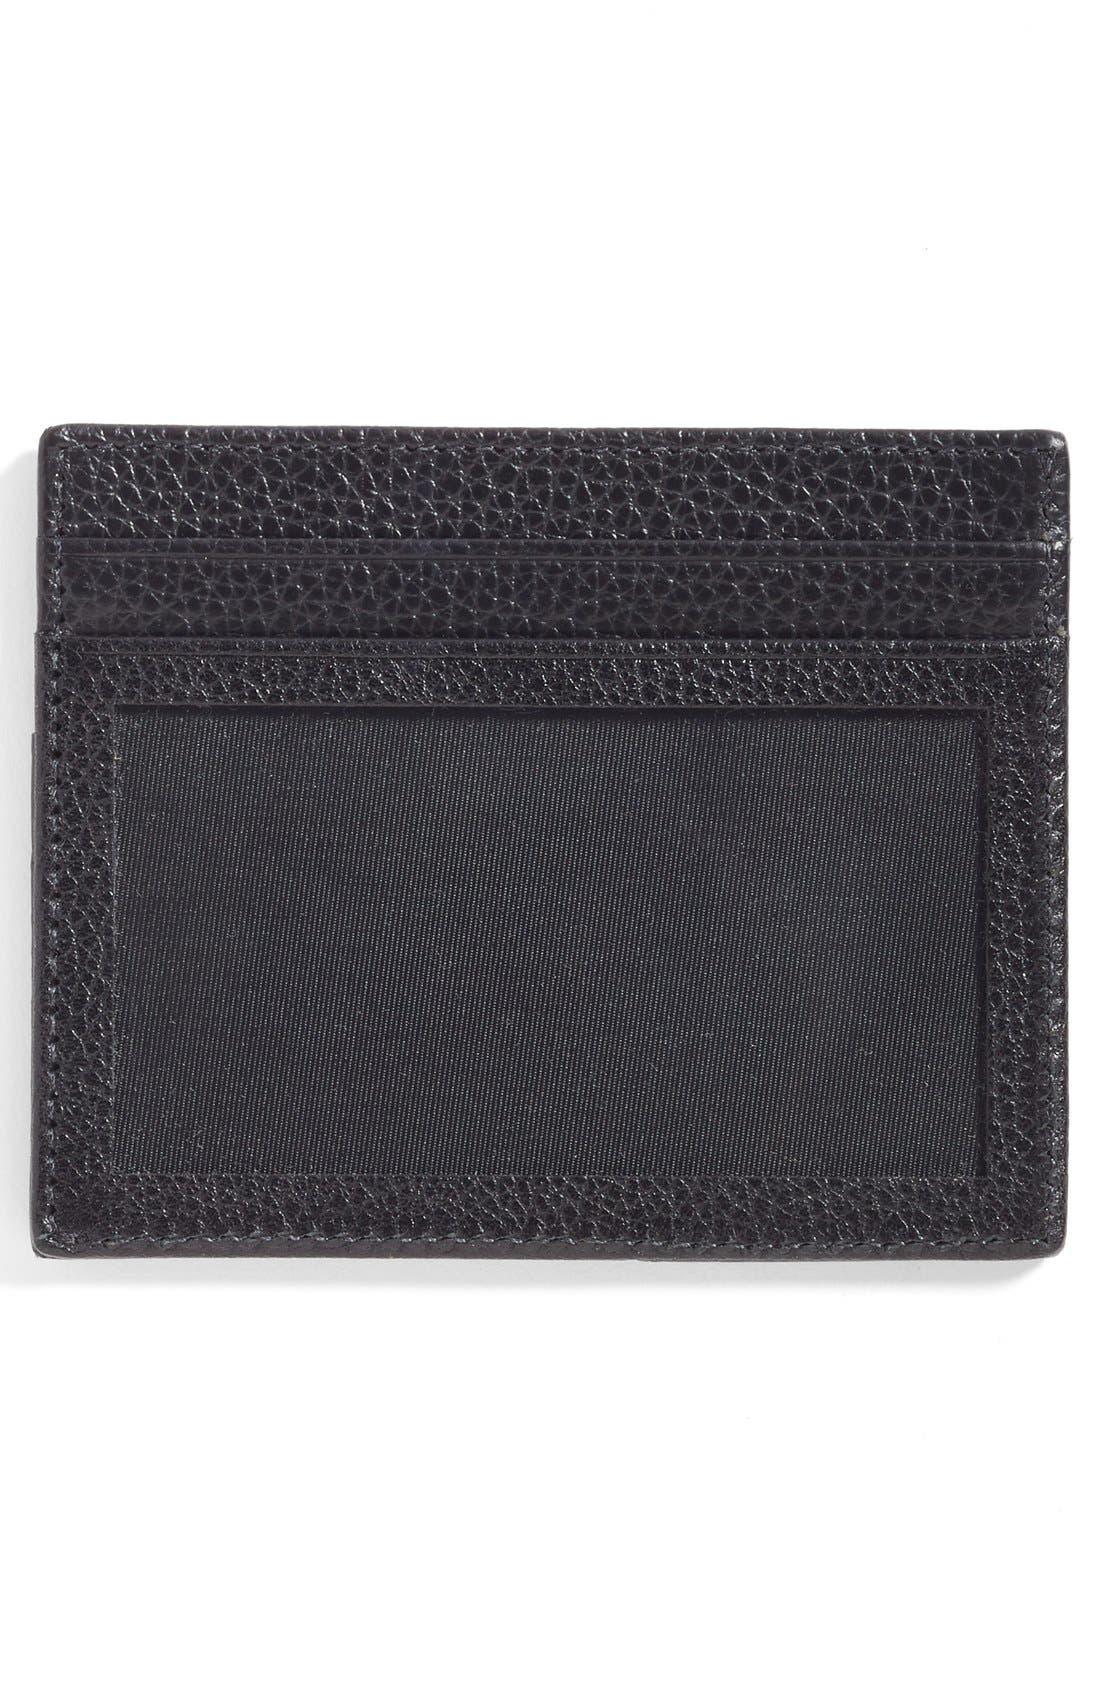 Executive Leather Card Case,                             Alternate thumbnail 3, color,                             001